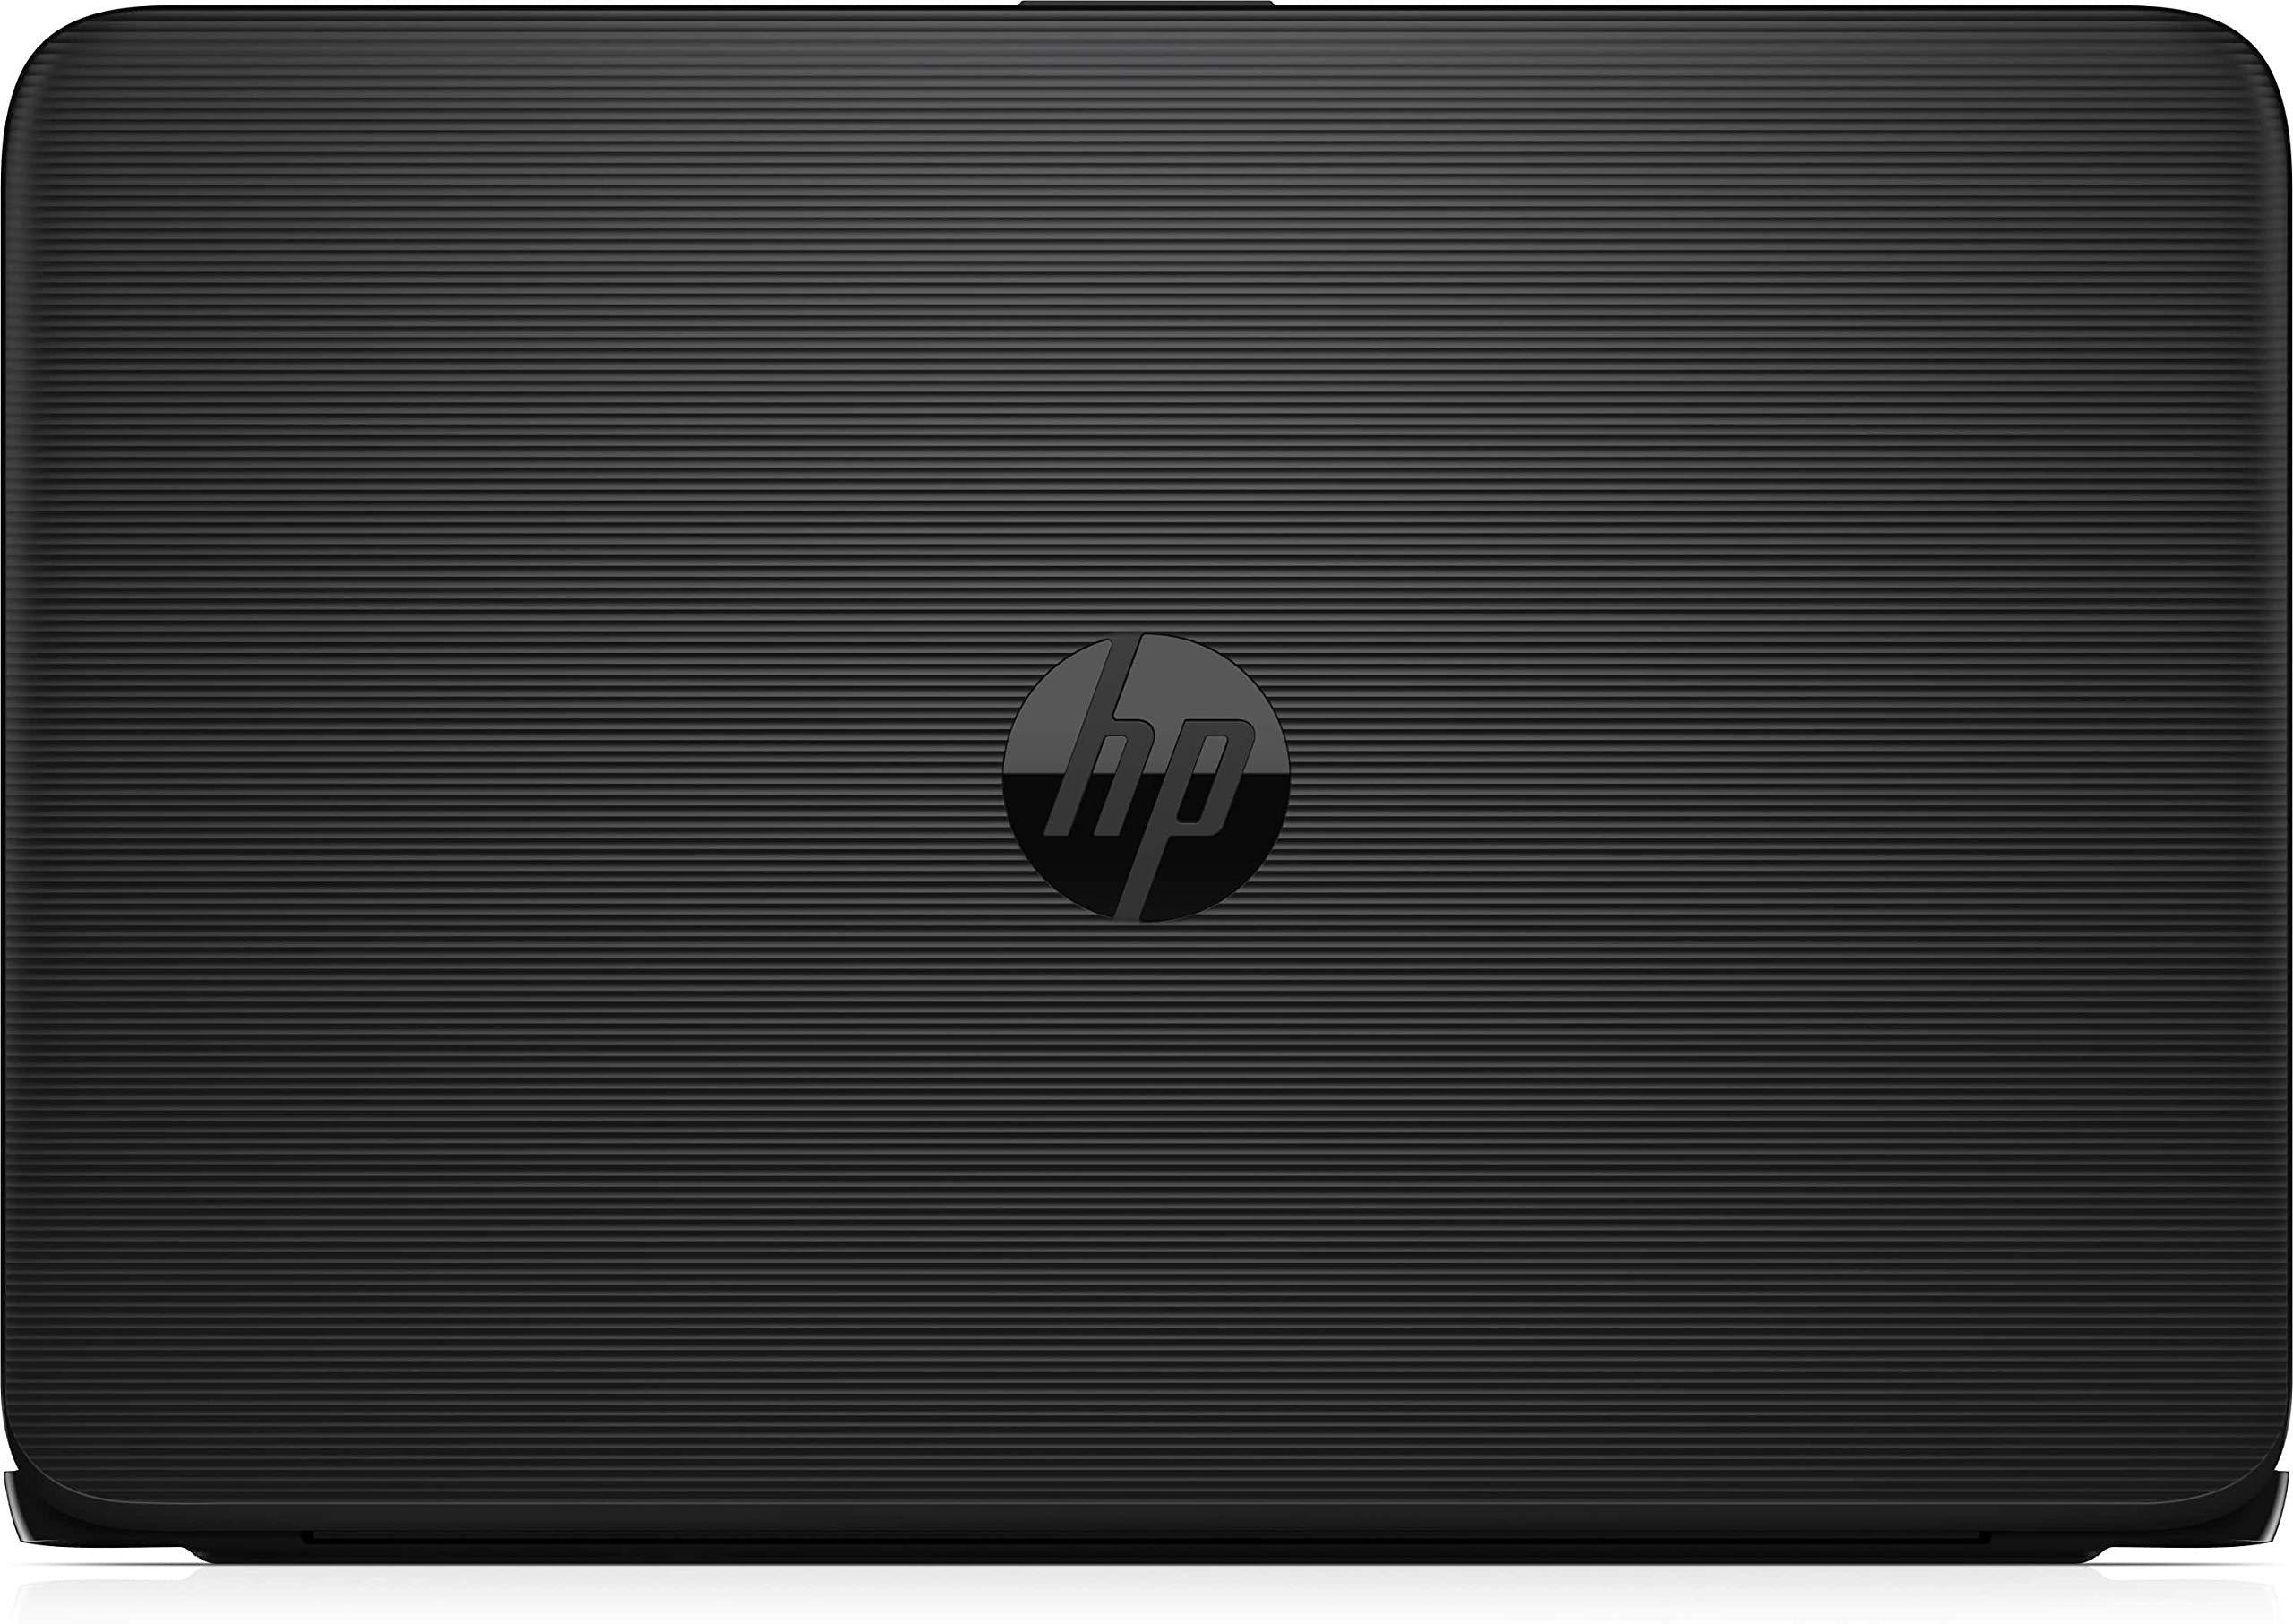 "2018 Newest HP 14"" Flagship Laptop PC - Intel Dual Core up to 2.48GHz, 4GB RAM, 32GB eMMC, Free 1-yr Office 365, 1TB OneDrive Cloud, DTS Studio, WLAN, HDMI, Webcam, USB 3.0, Windows 10 2"